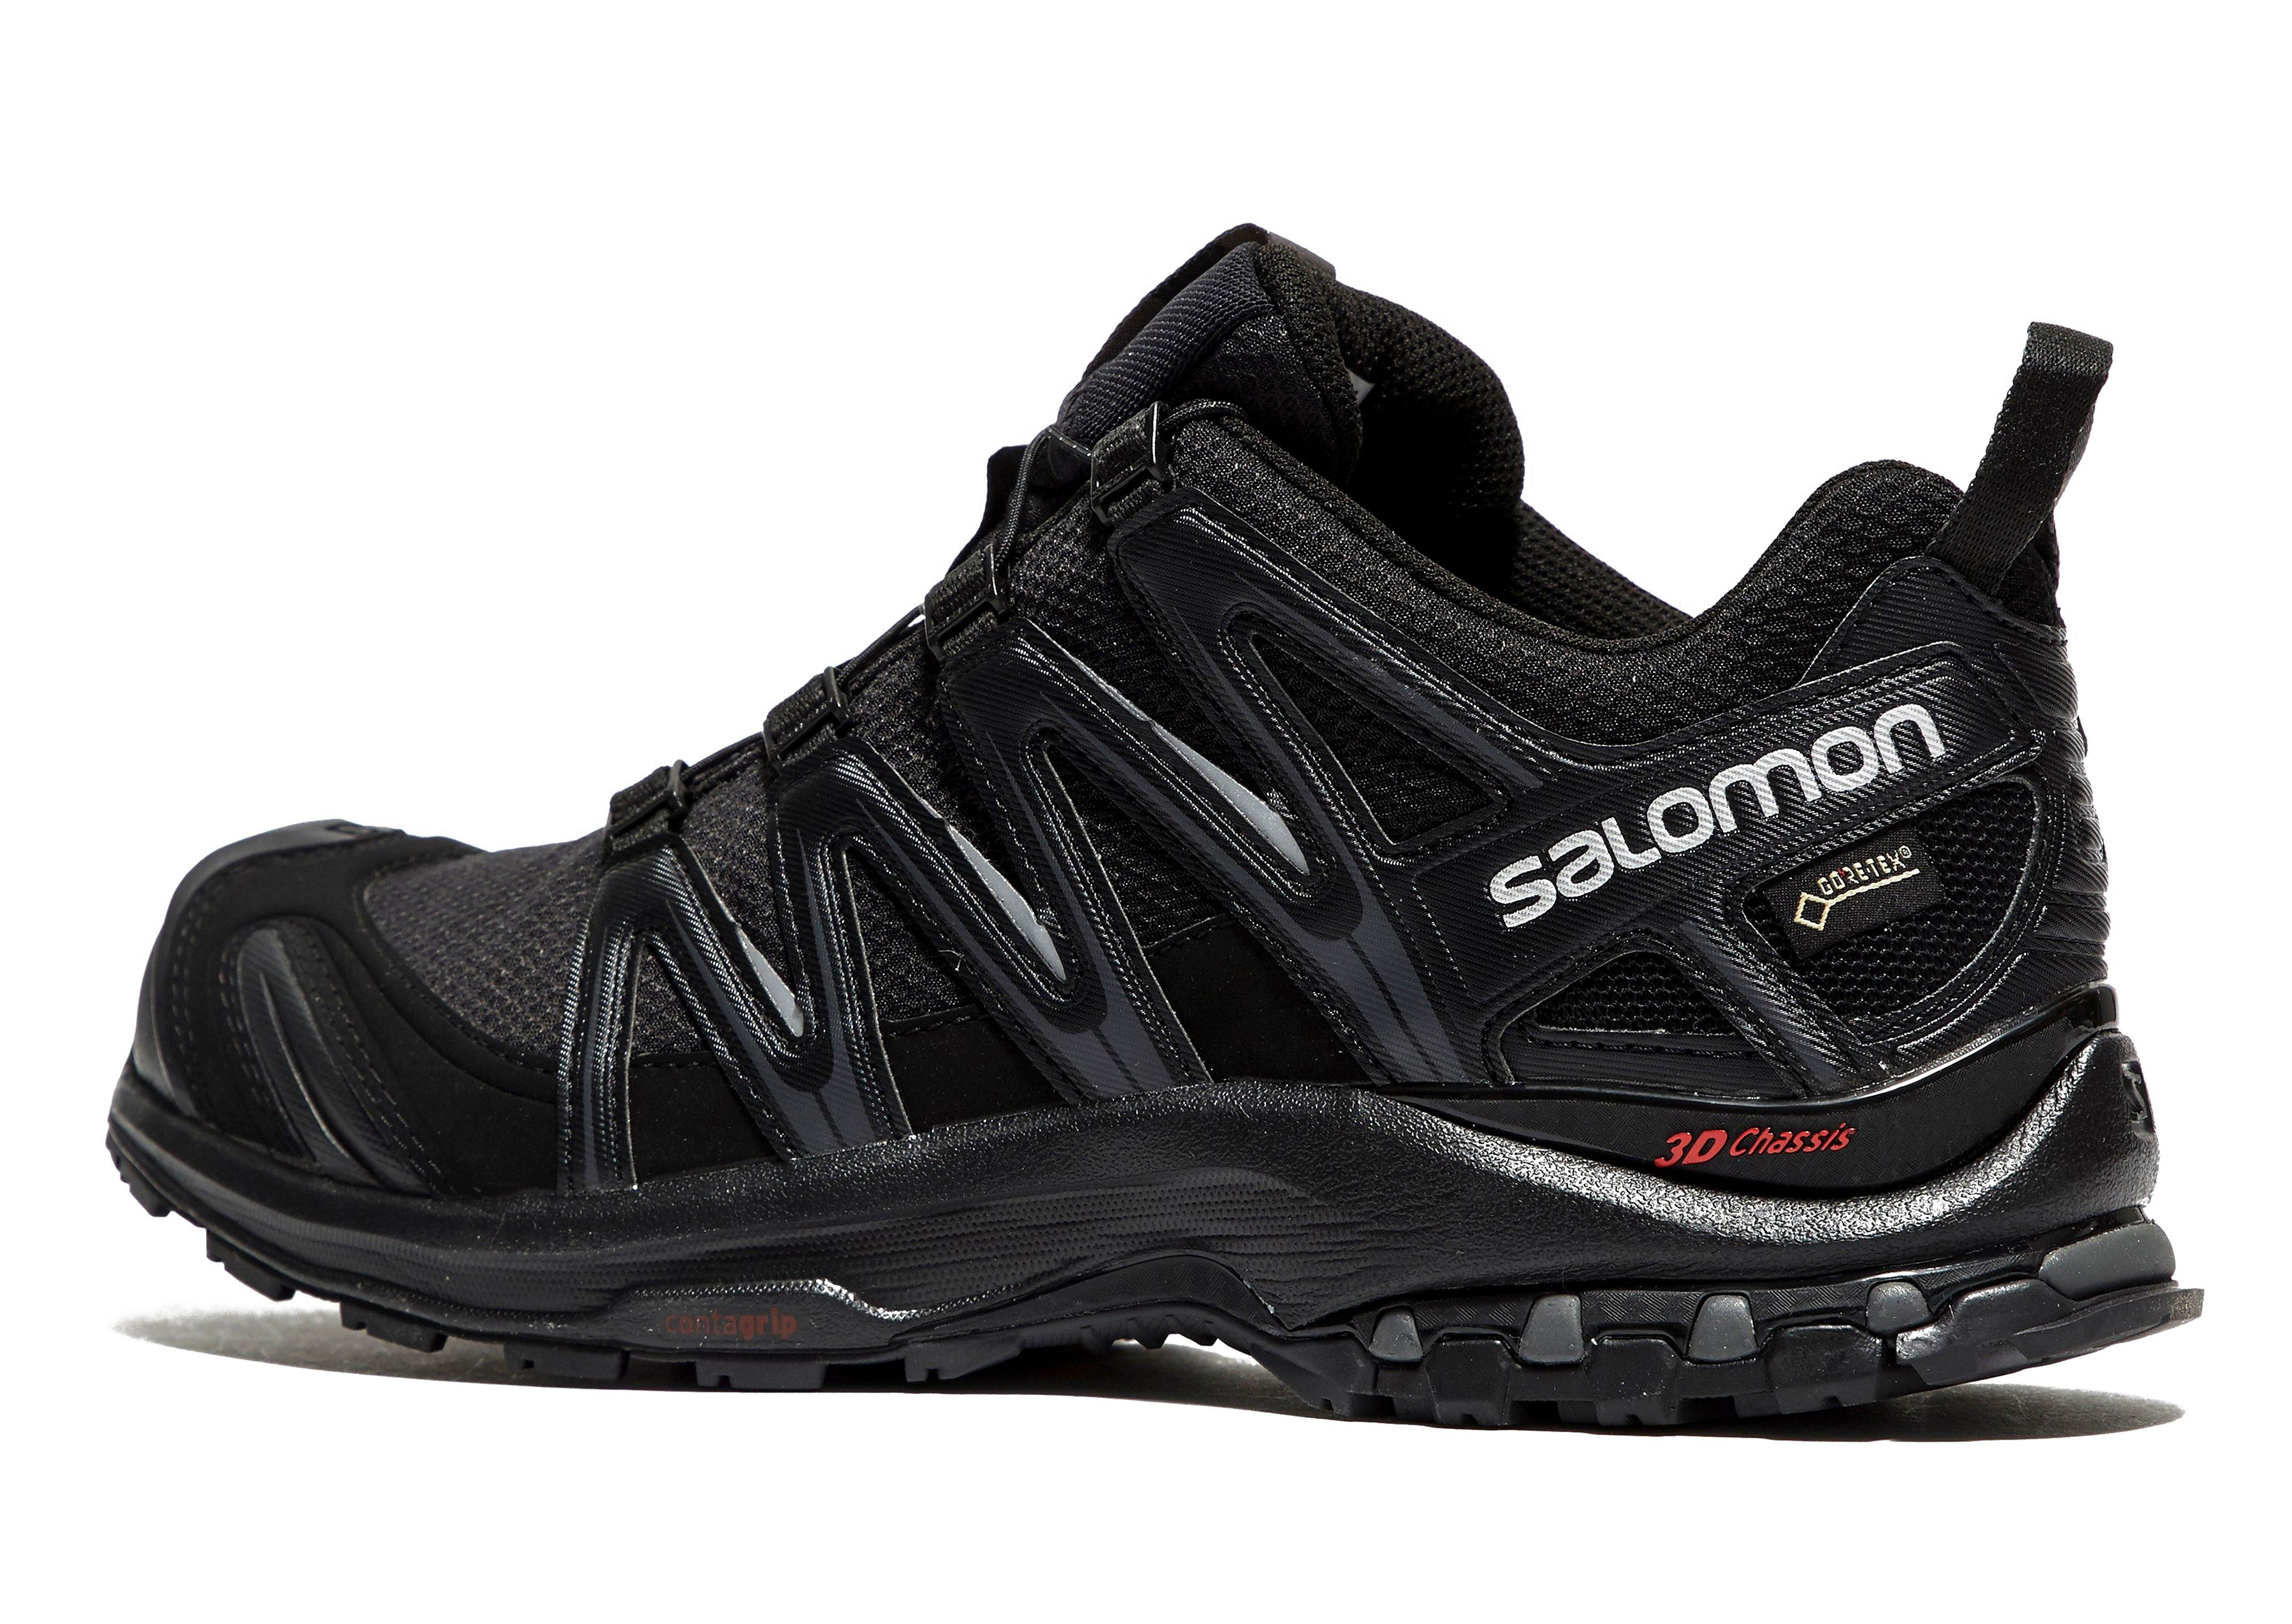 Salomon XA Pro 3D Trail Shoes